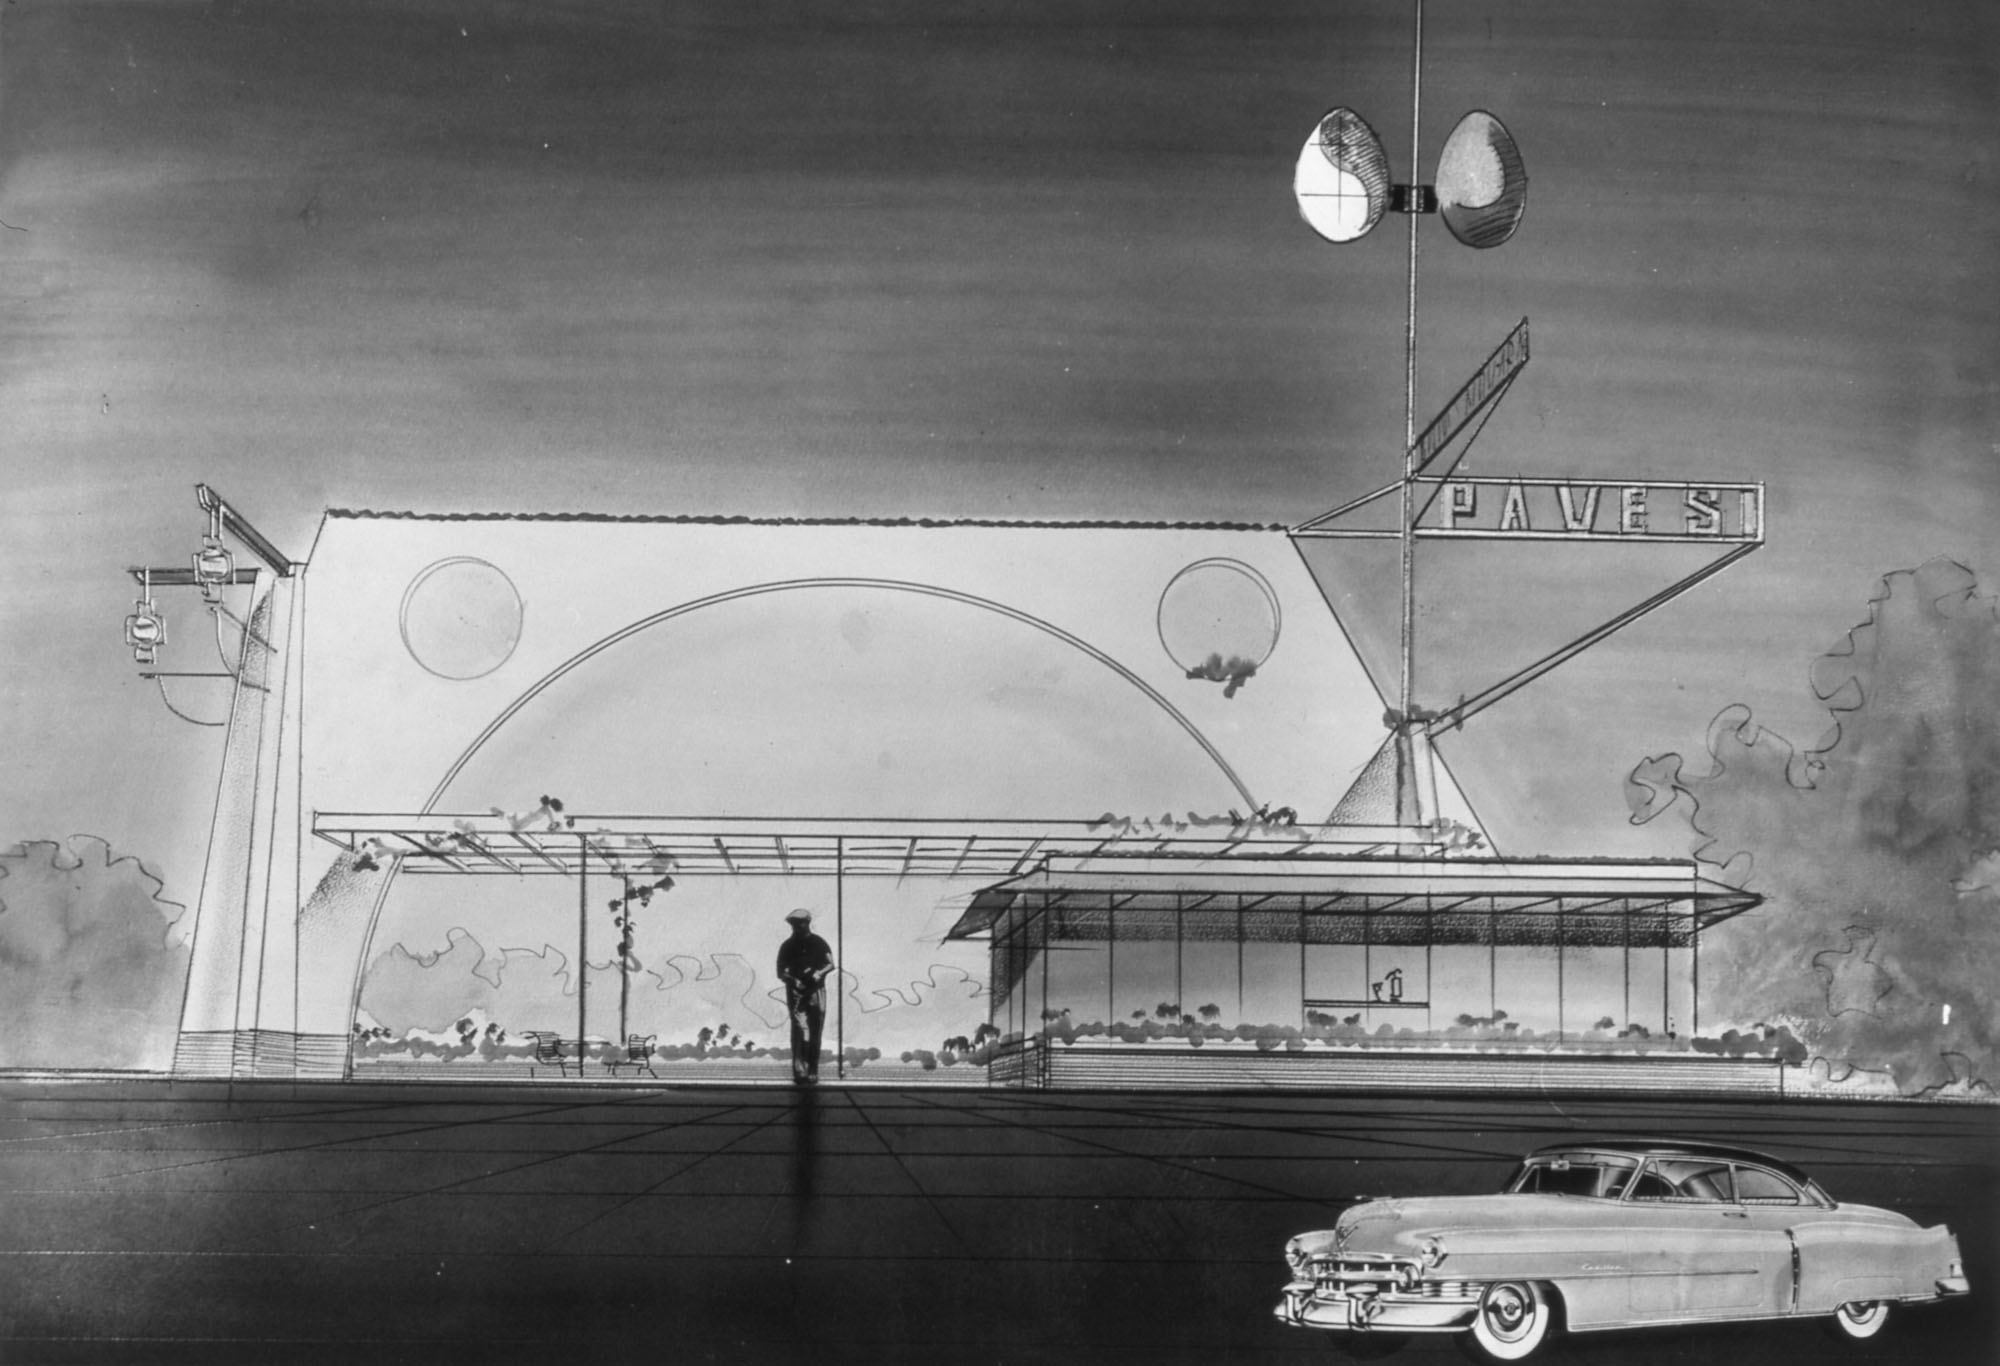 Novara Service Station, perspective drawing